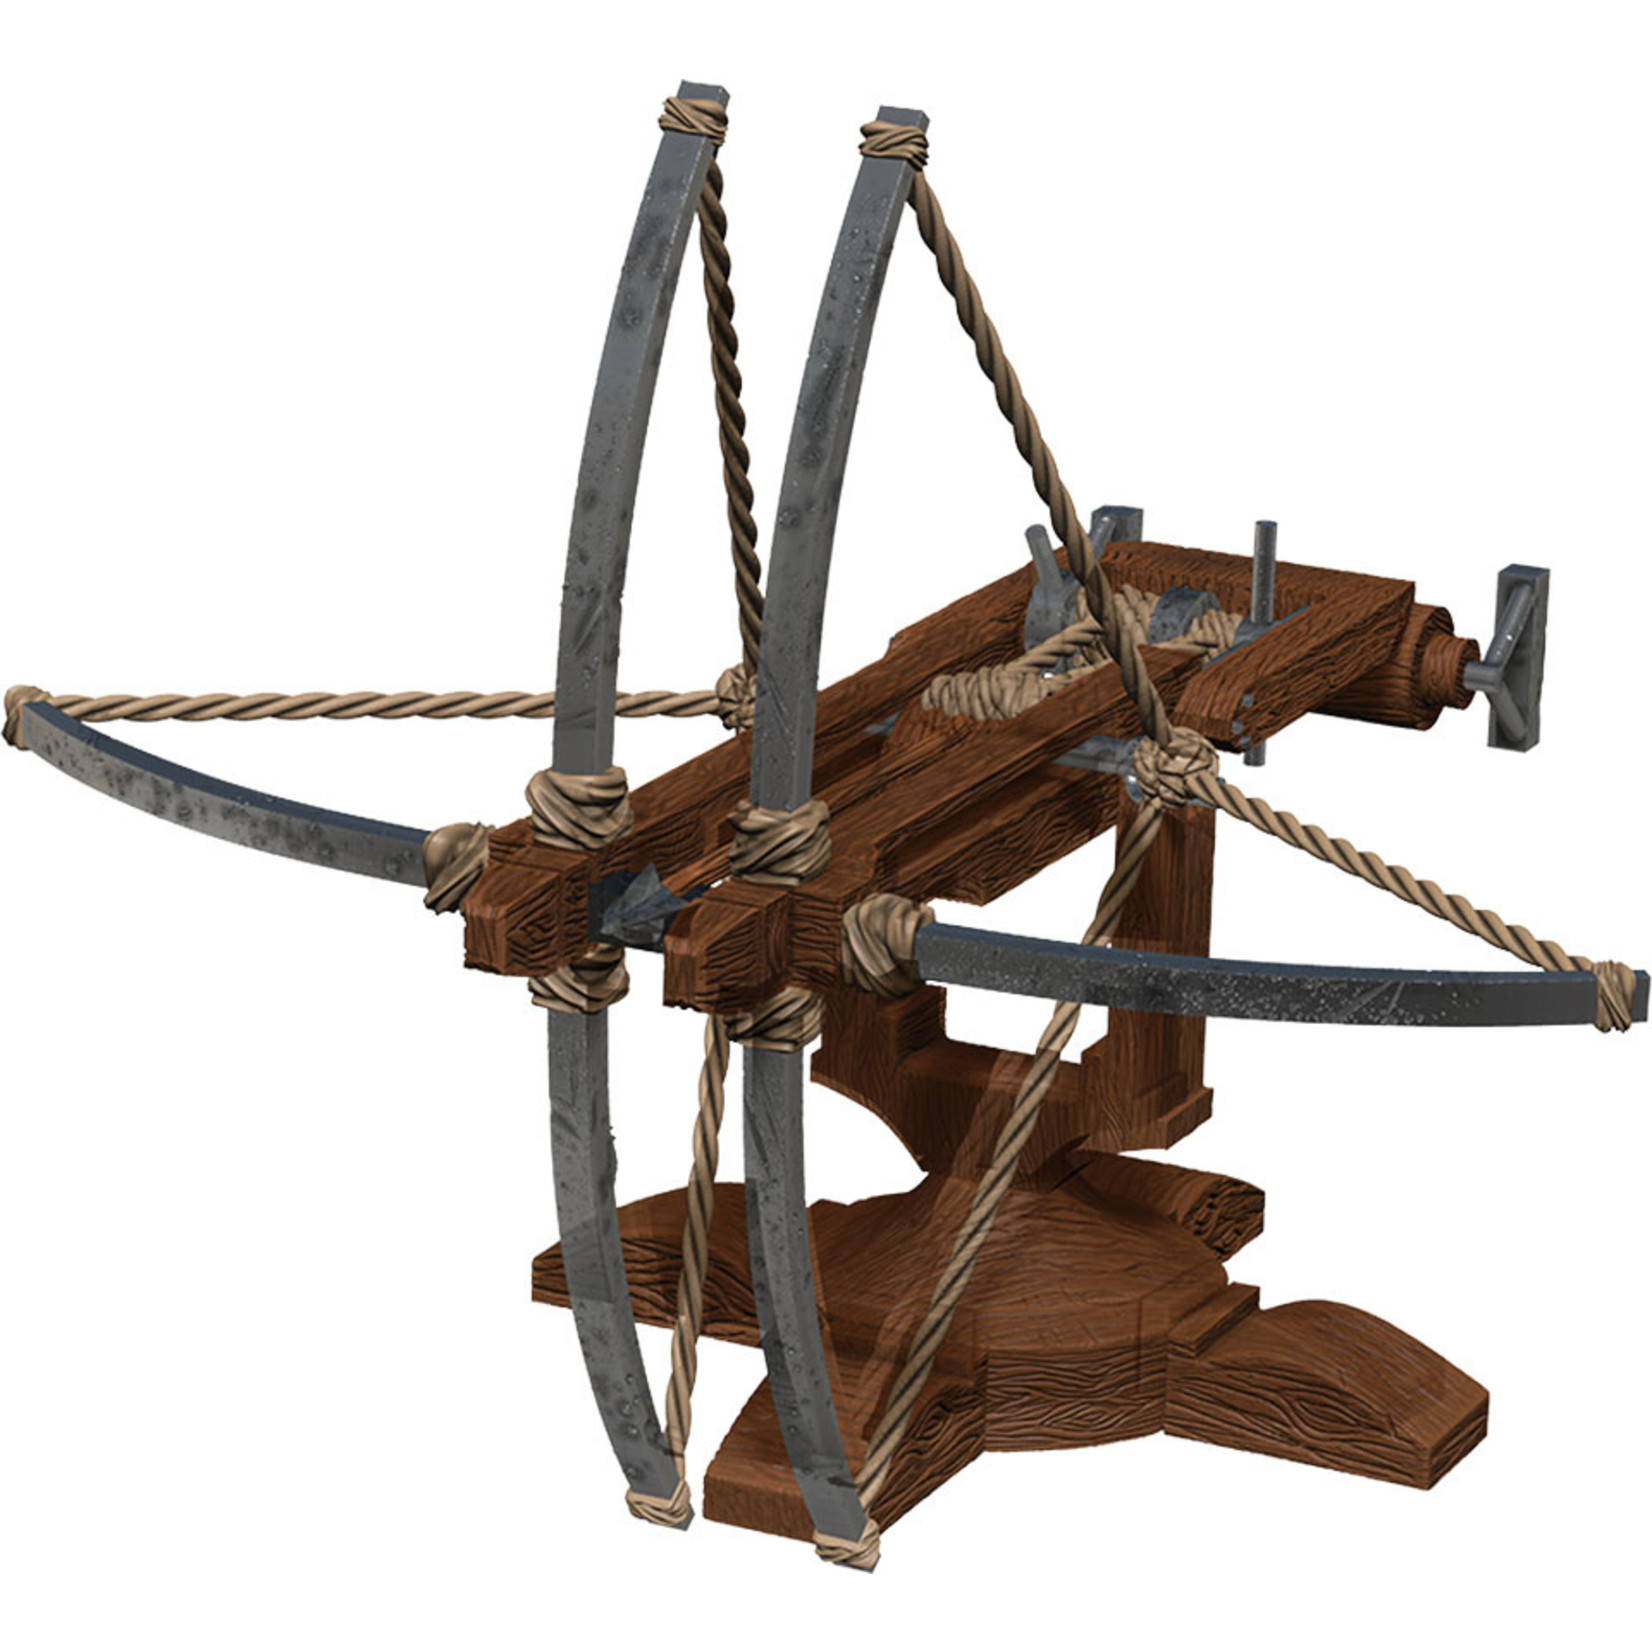 WIZKIDS/NECA Ballista War Machine 4D Settings